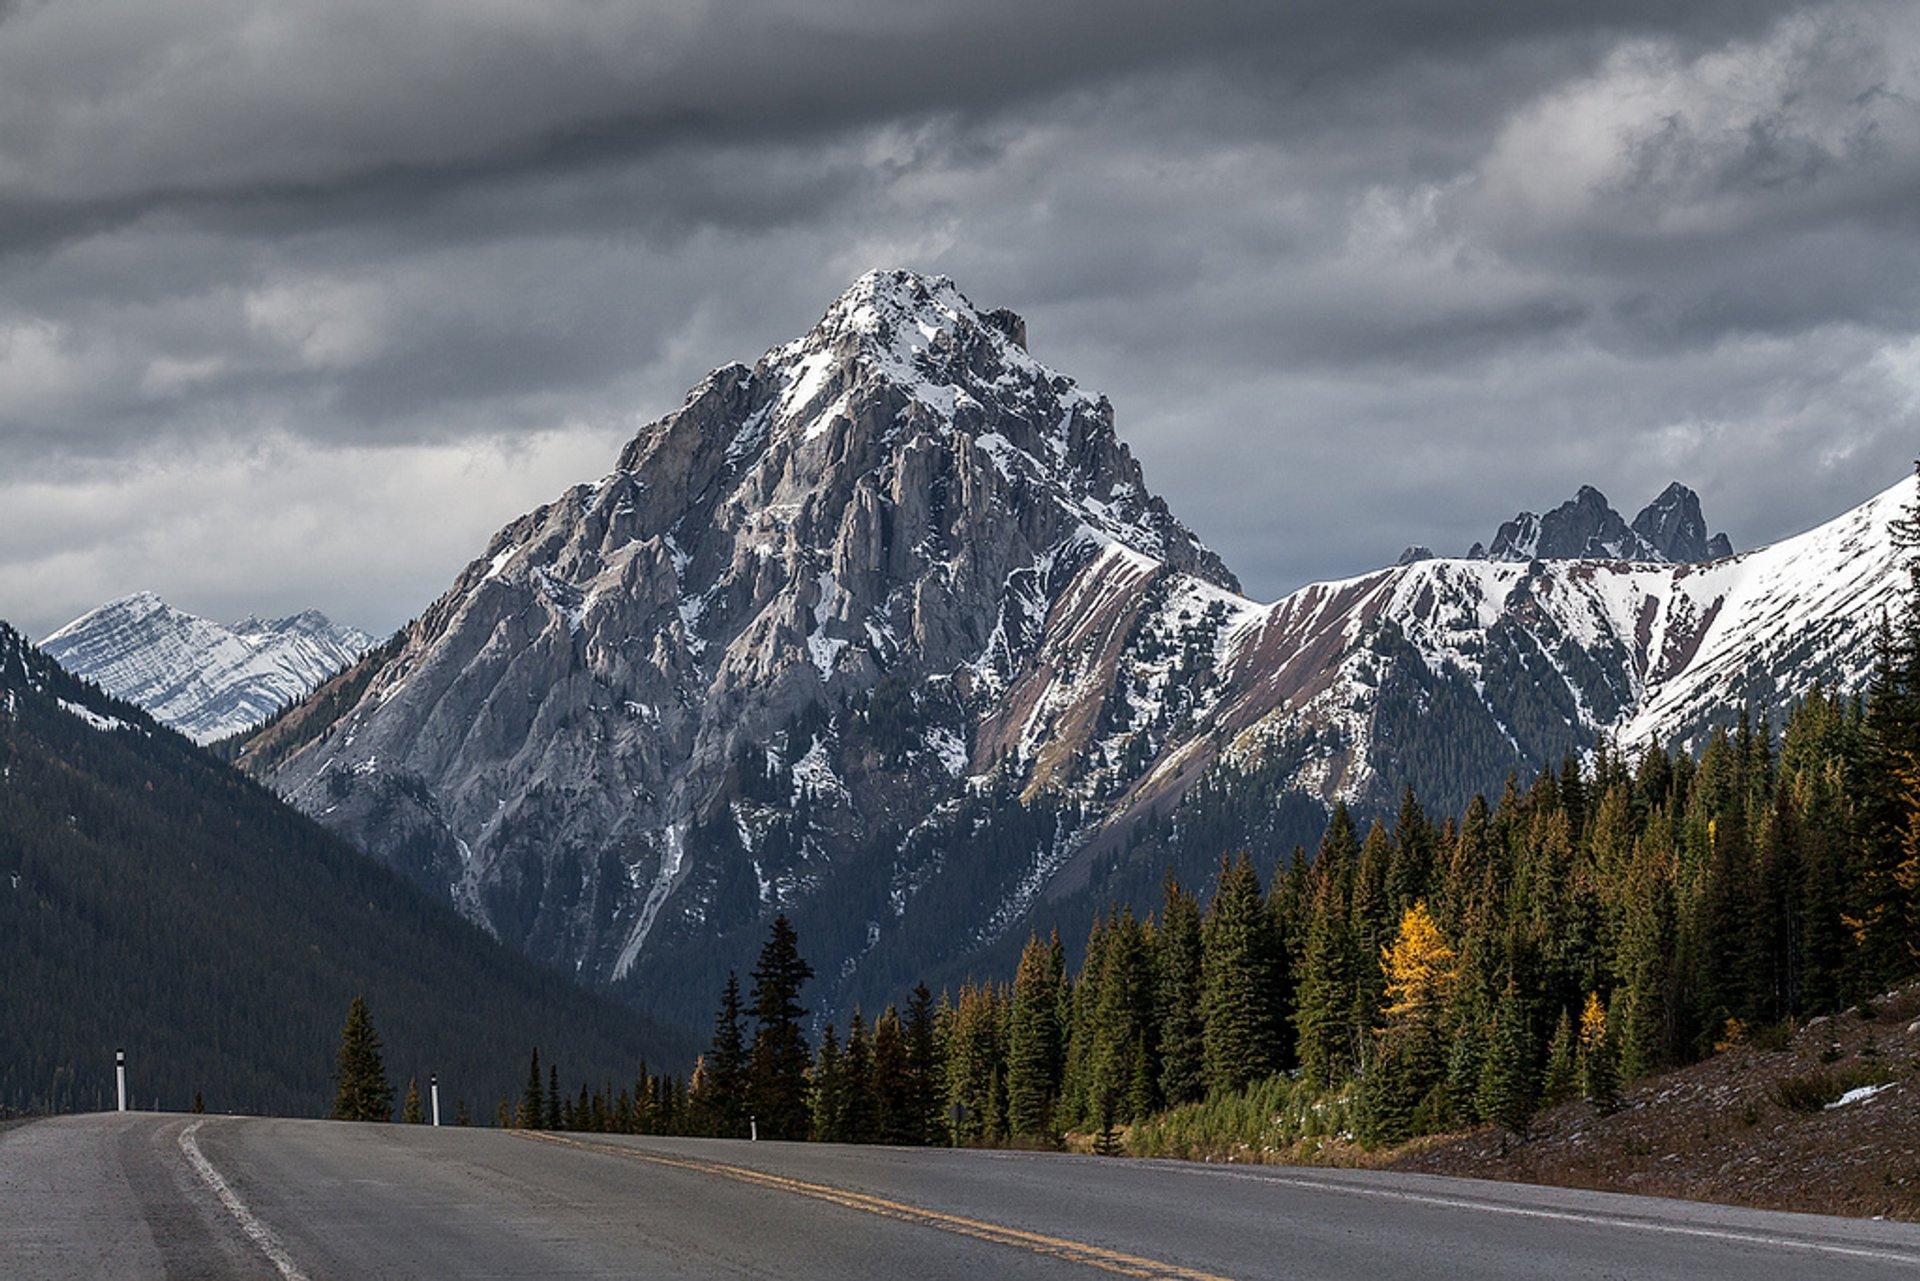 Gap mountain, by Highway #40, Kananaskis country, Alberta, Canada 2019